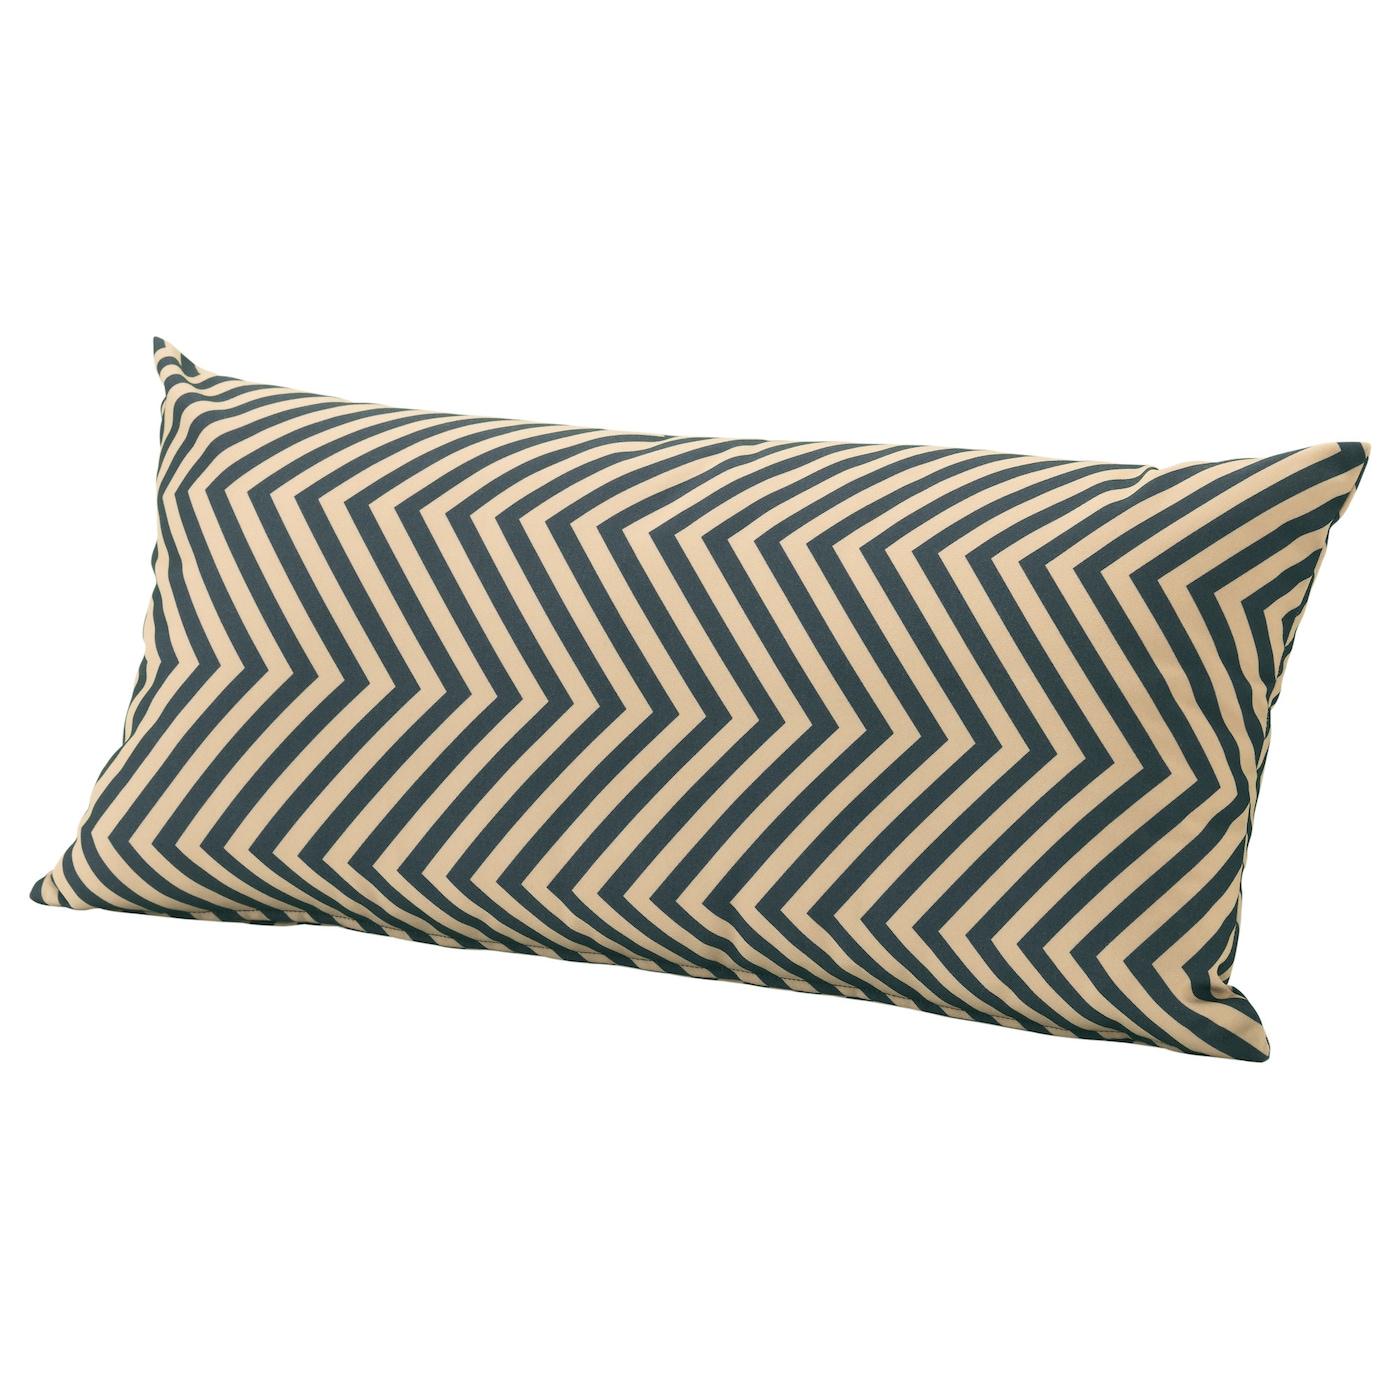 Outdoor Cushions & Garden Cushions